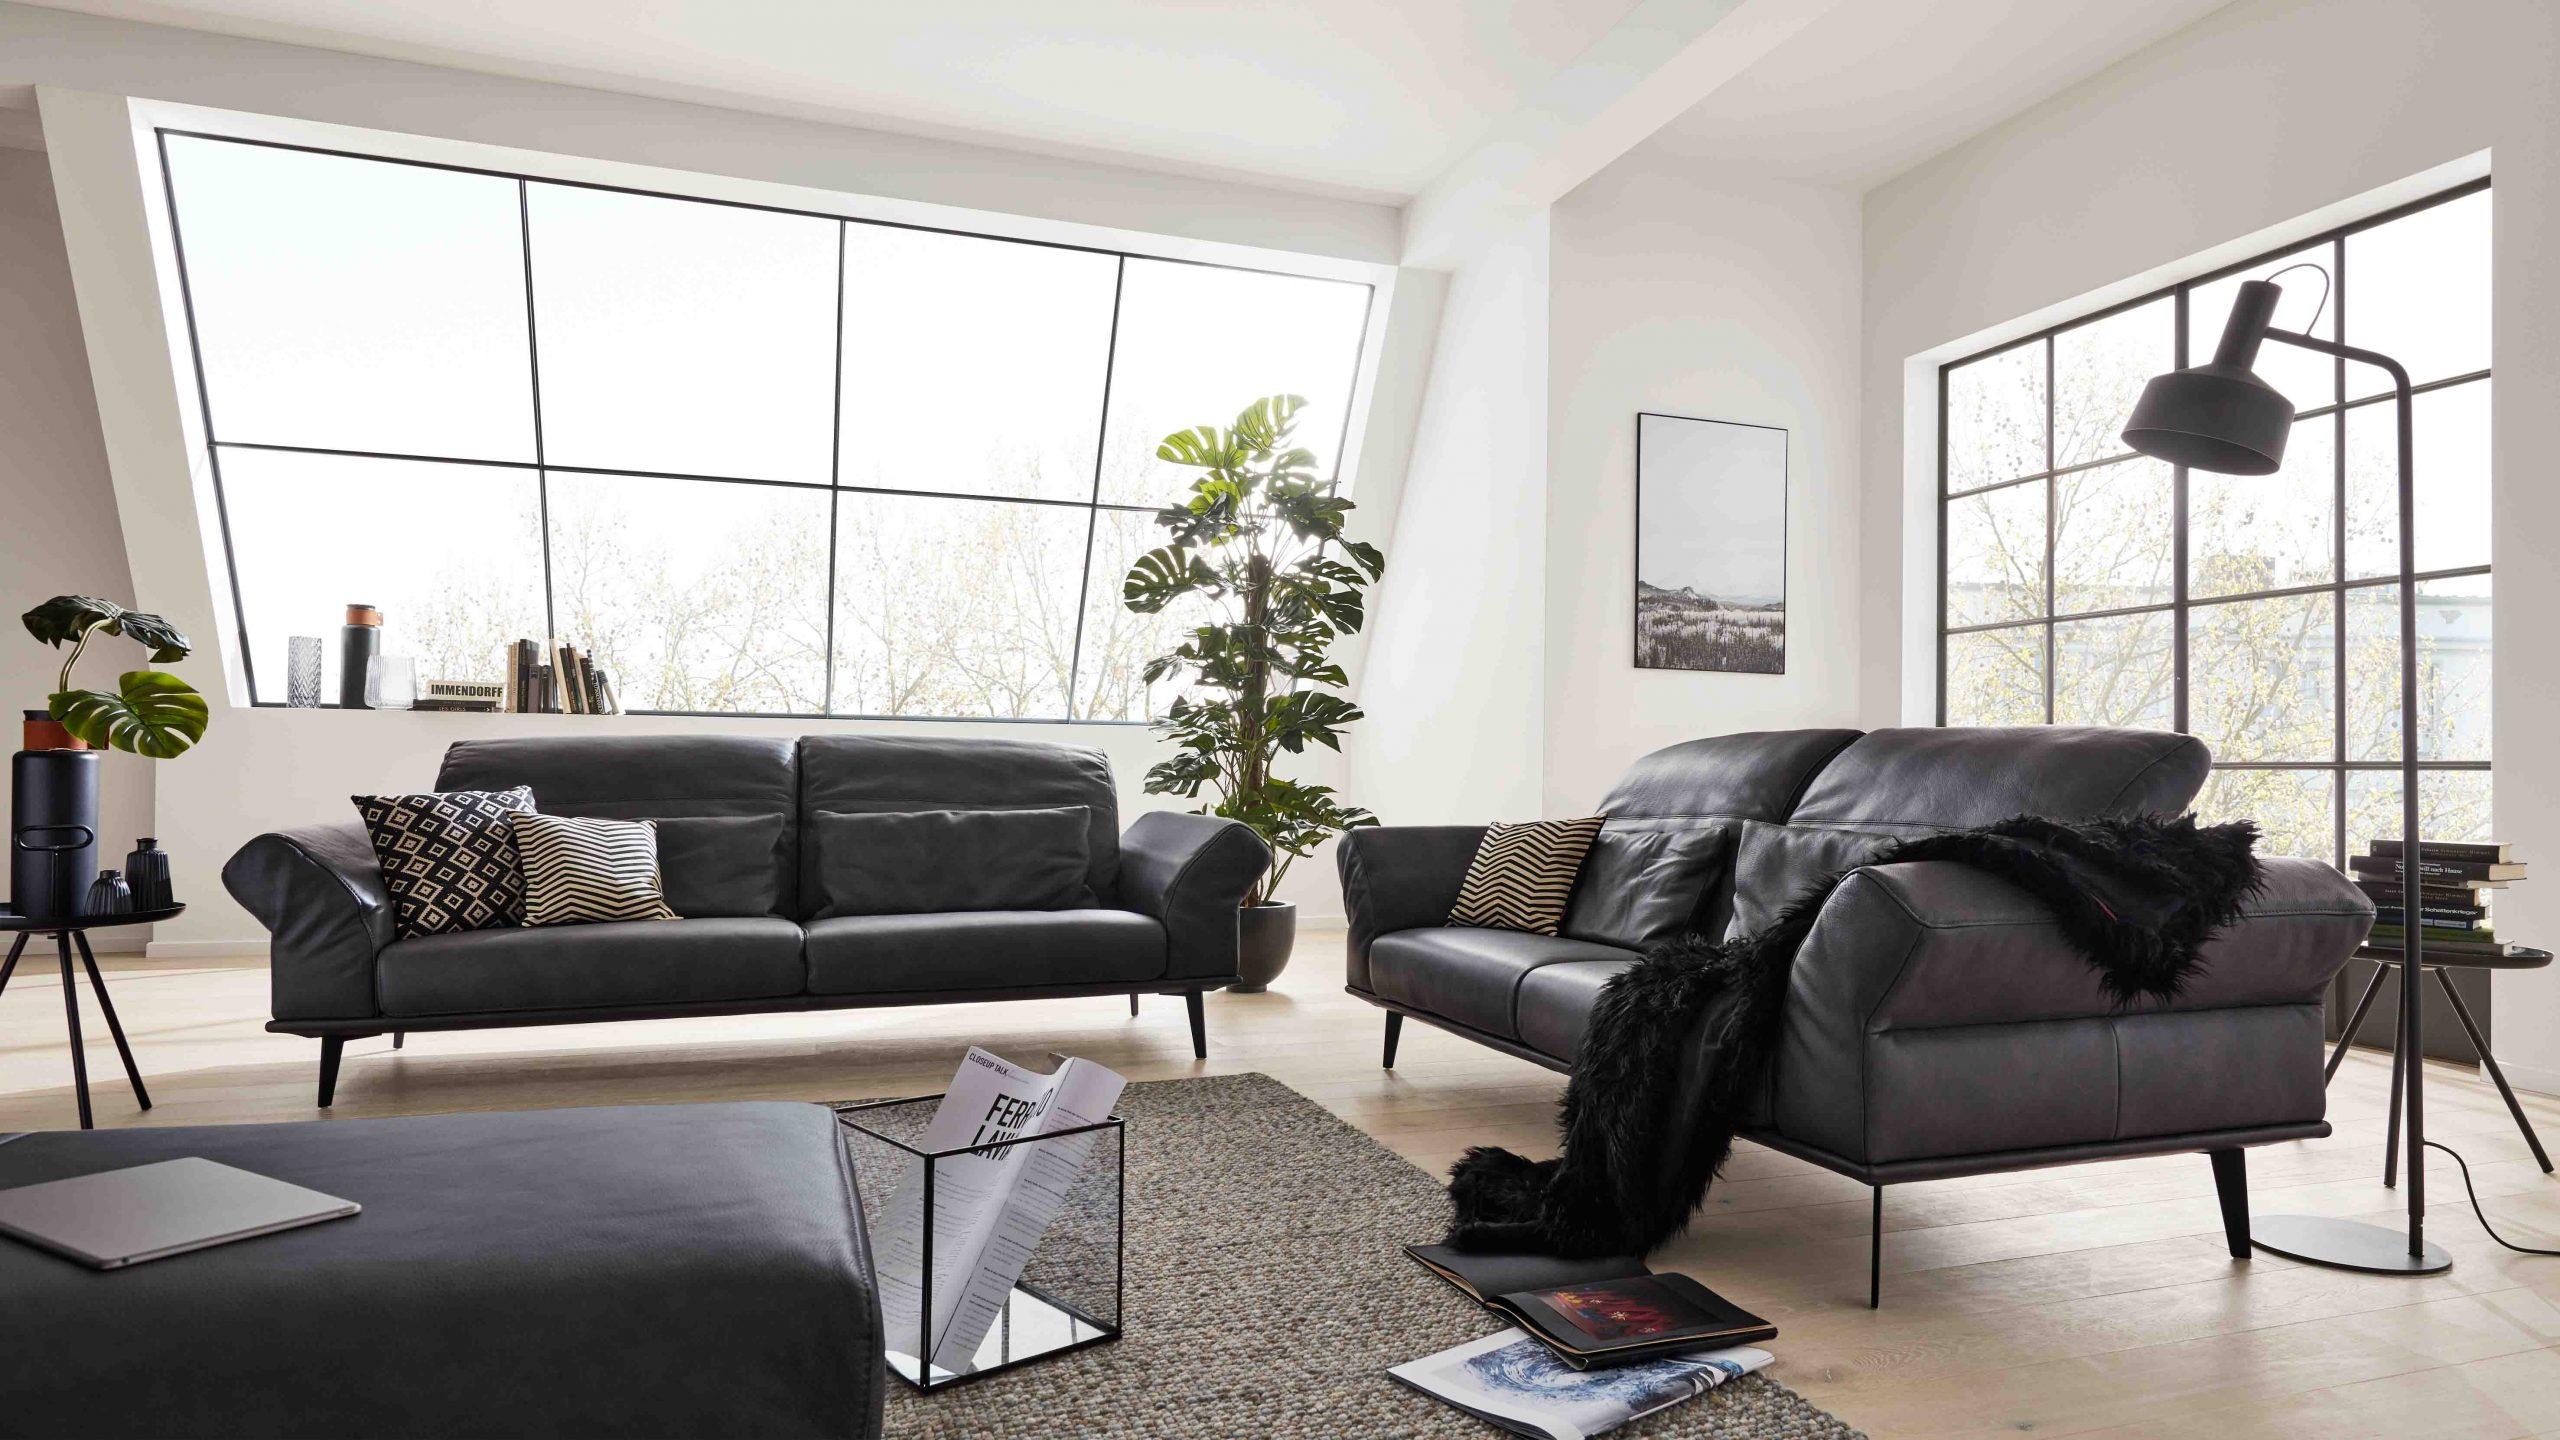 Interliving Sofa Serie 4003 in anthrazit - Variantenvielfalt